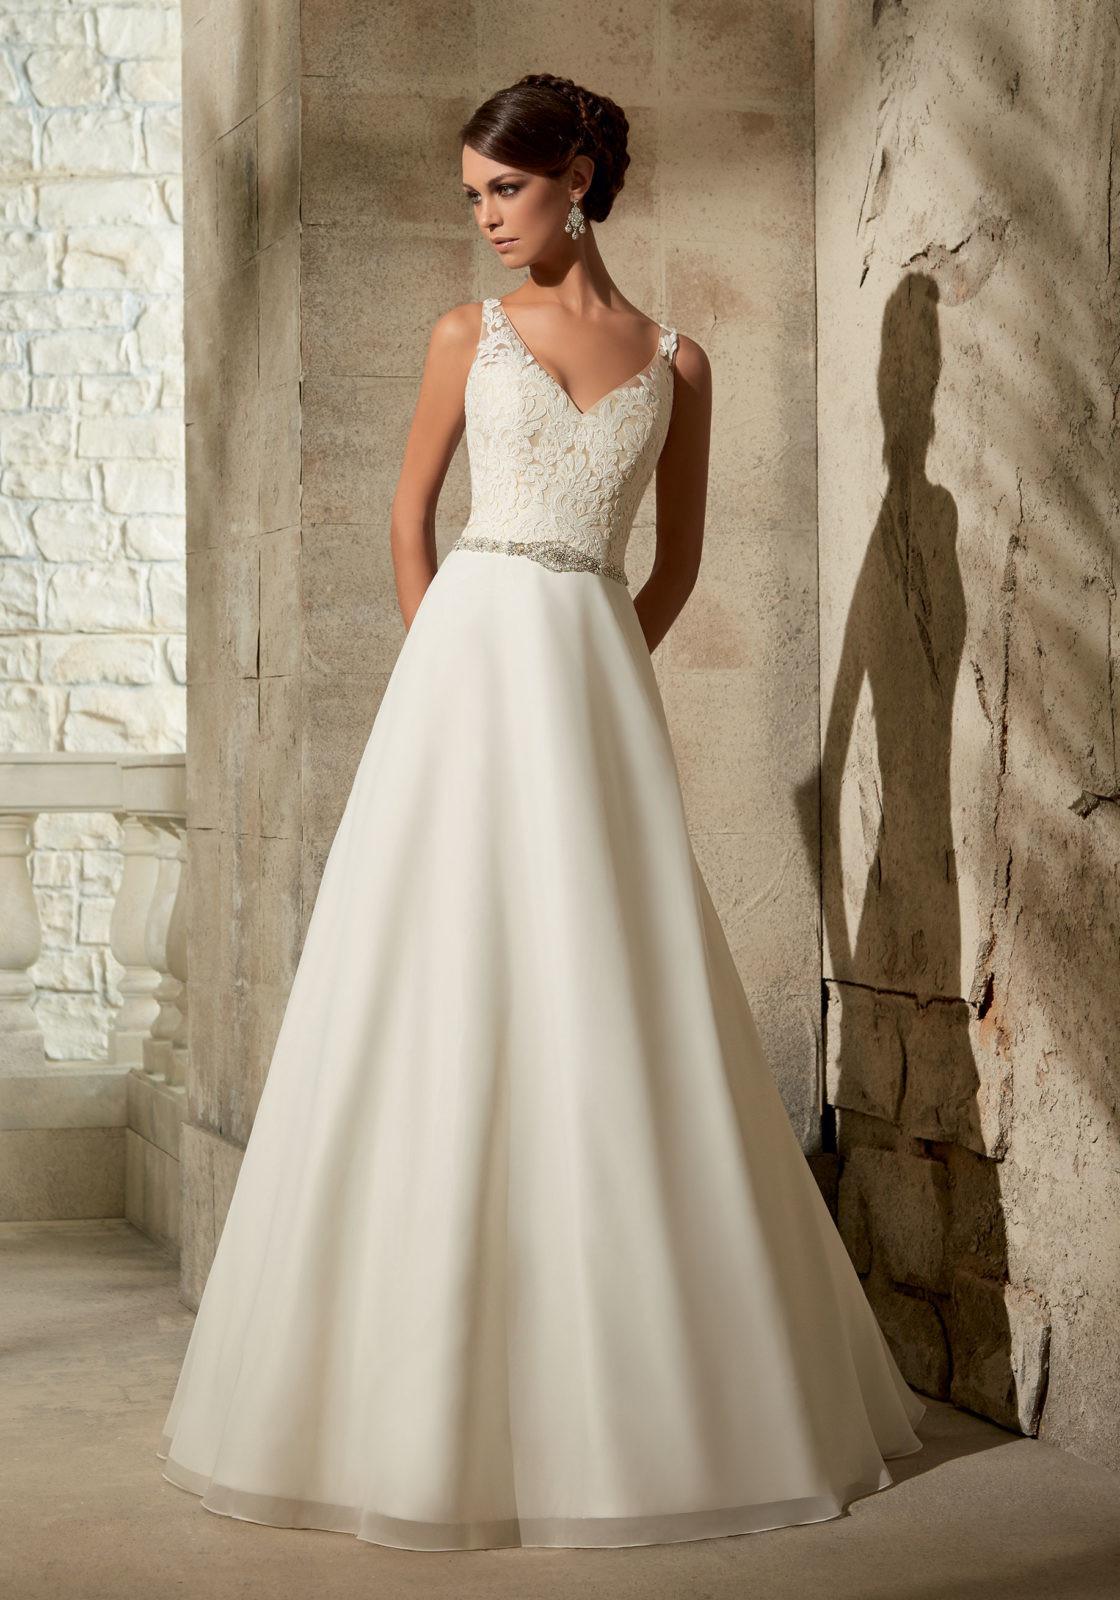 Chiffon Wedding Gown  Chiffon with Crystal Beading Wedding Dress